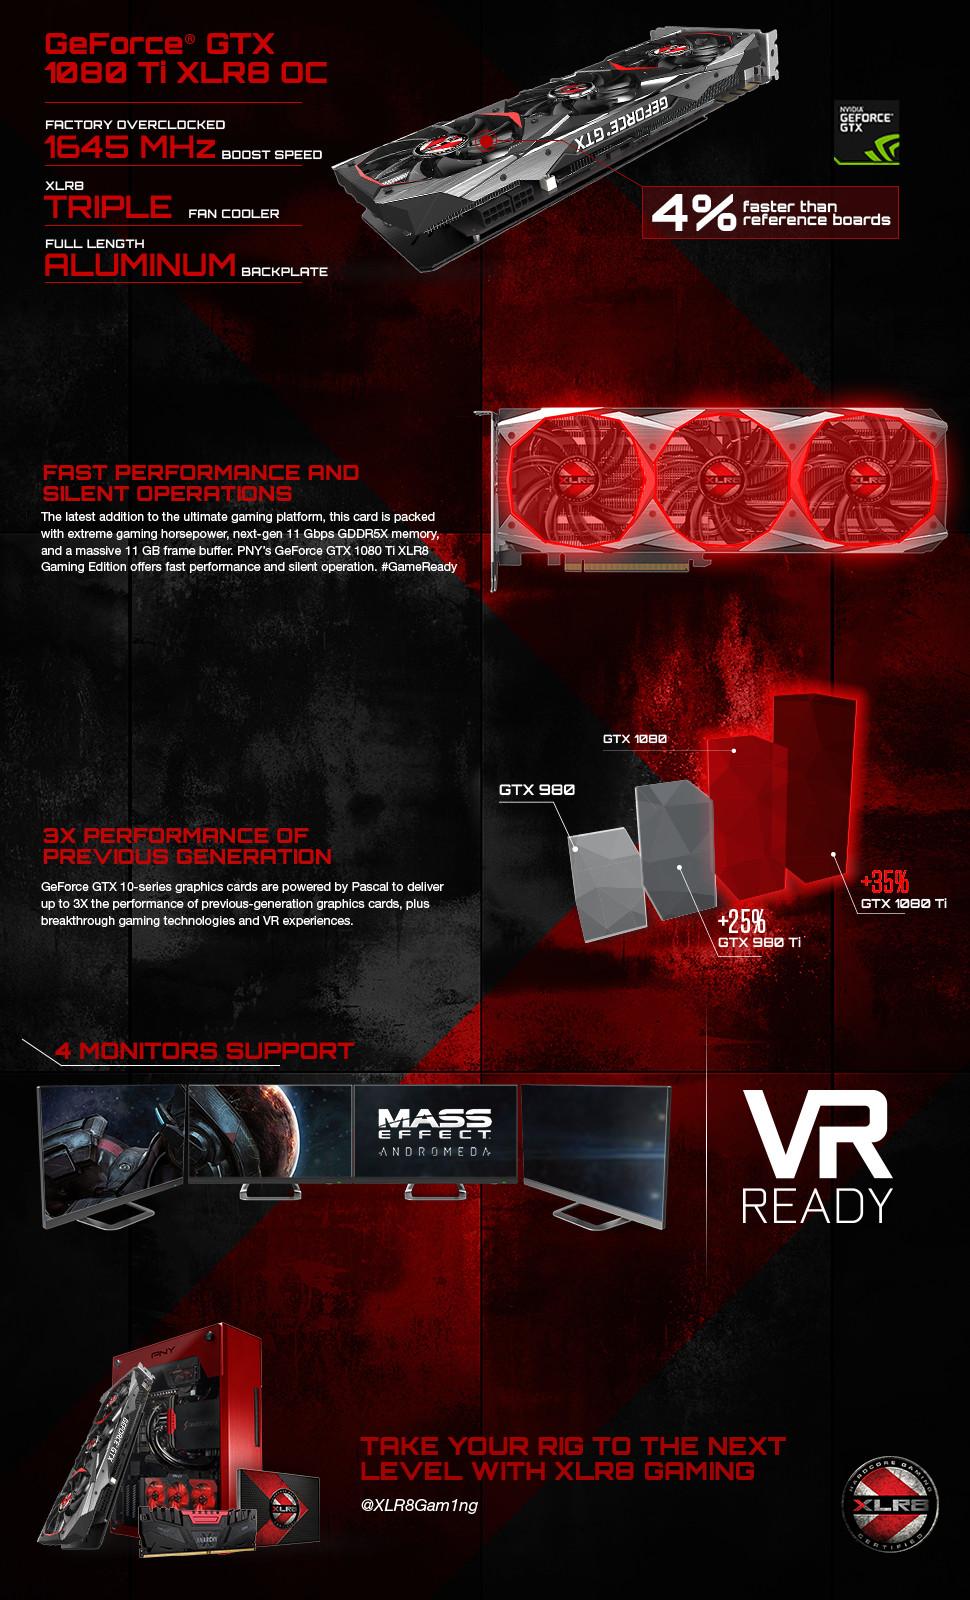 pny geforce gtx 1080 ti 11gb xlr8 gaming oc. Black Bedroom Furniture Sets. Home Design Ideas